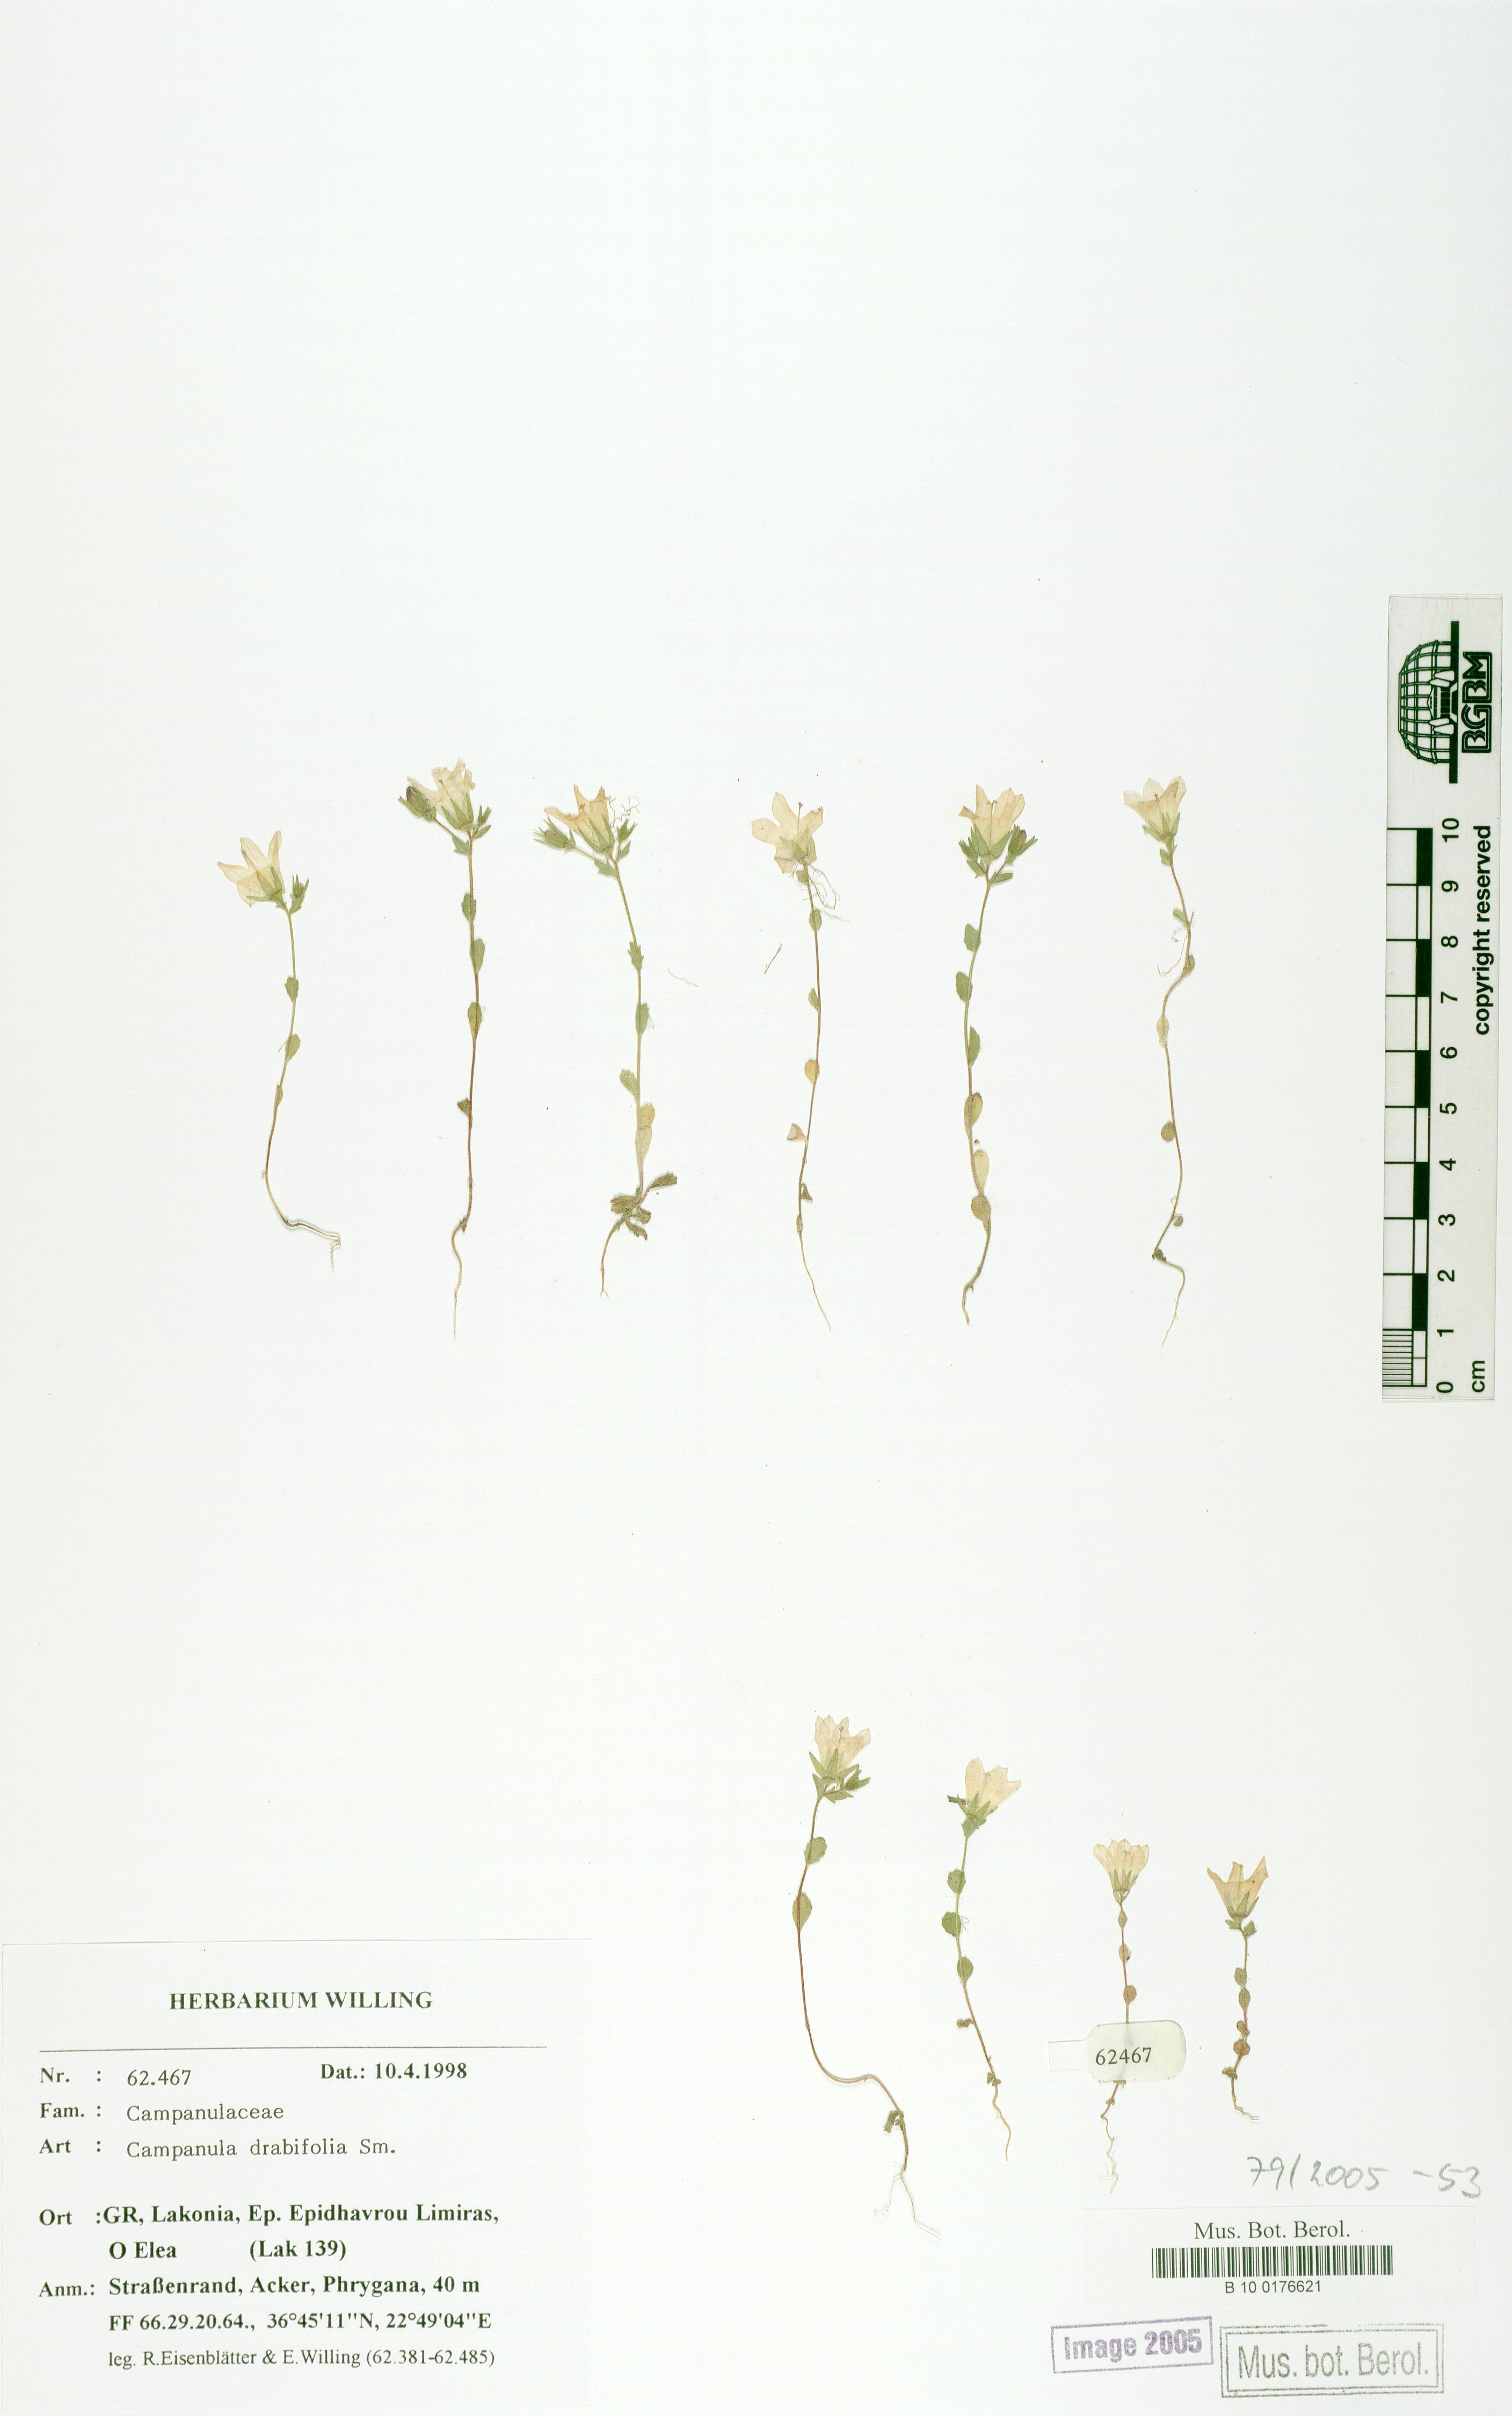 http://ww2.bgbm.org/herbarium/images/B/10/01/76/62/B_10_0176621.jpg